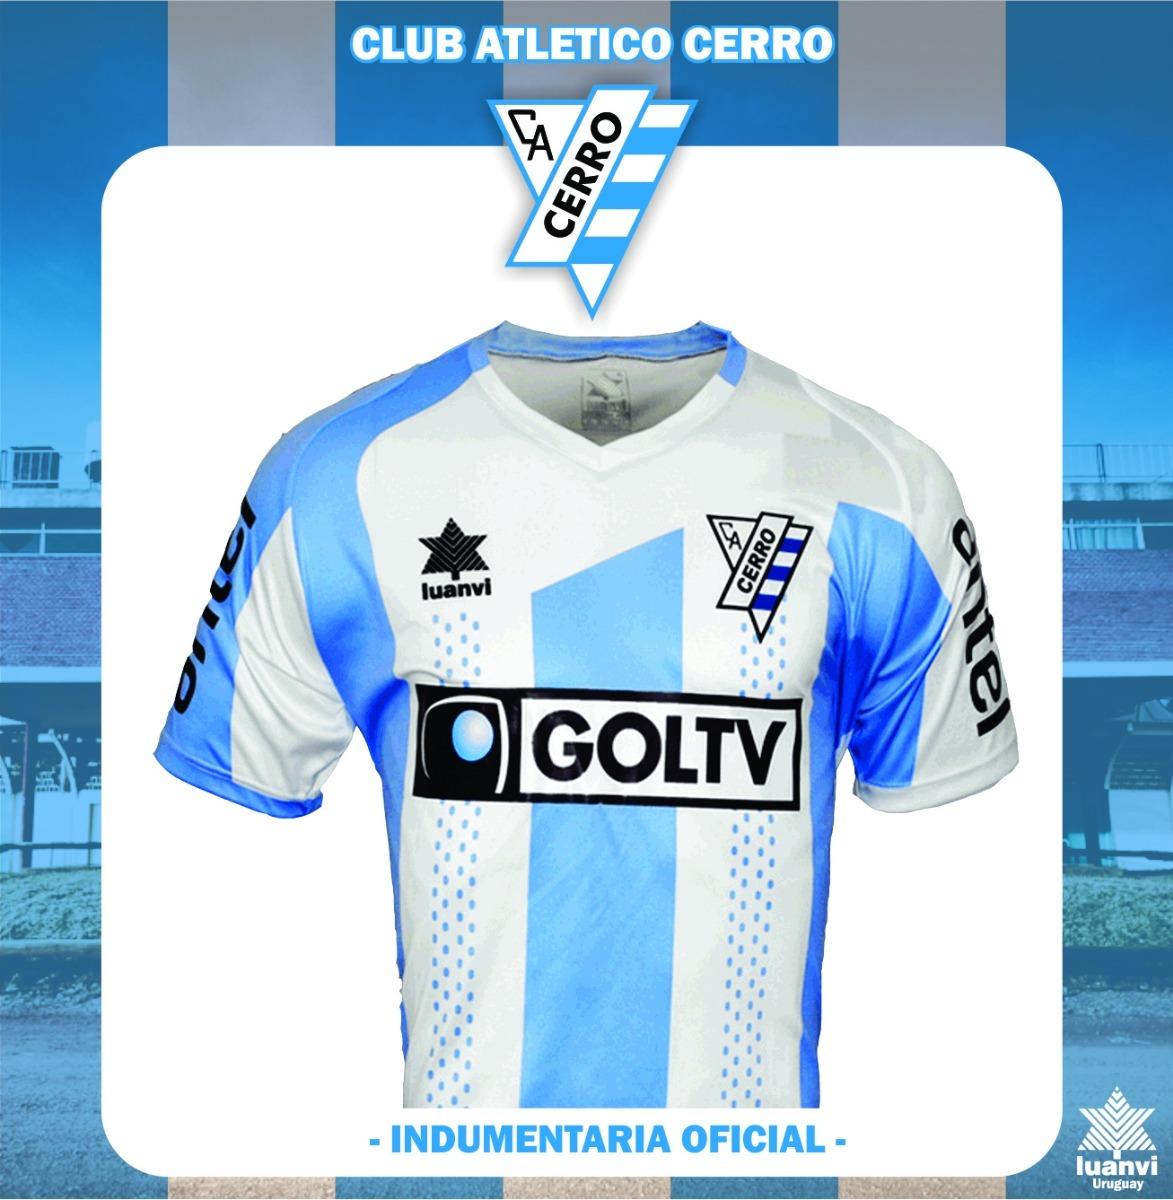 Camiseta Oficial Club Atlético Cerro - Luanvi - -   1.800 eb6795e283baf